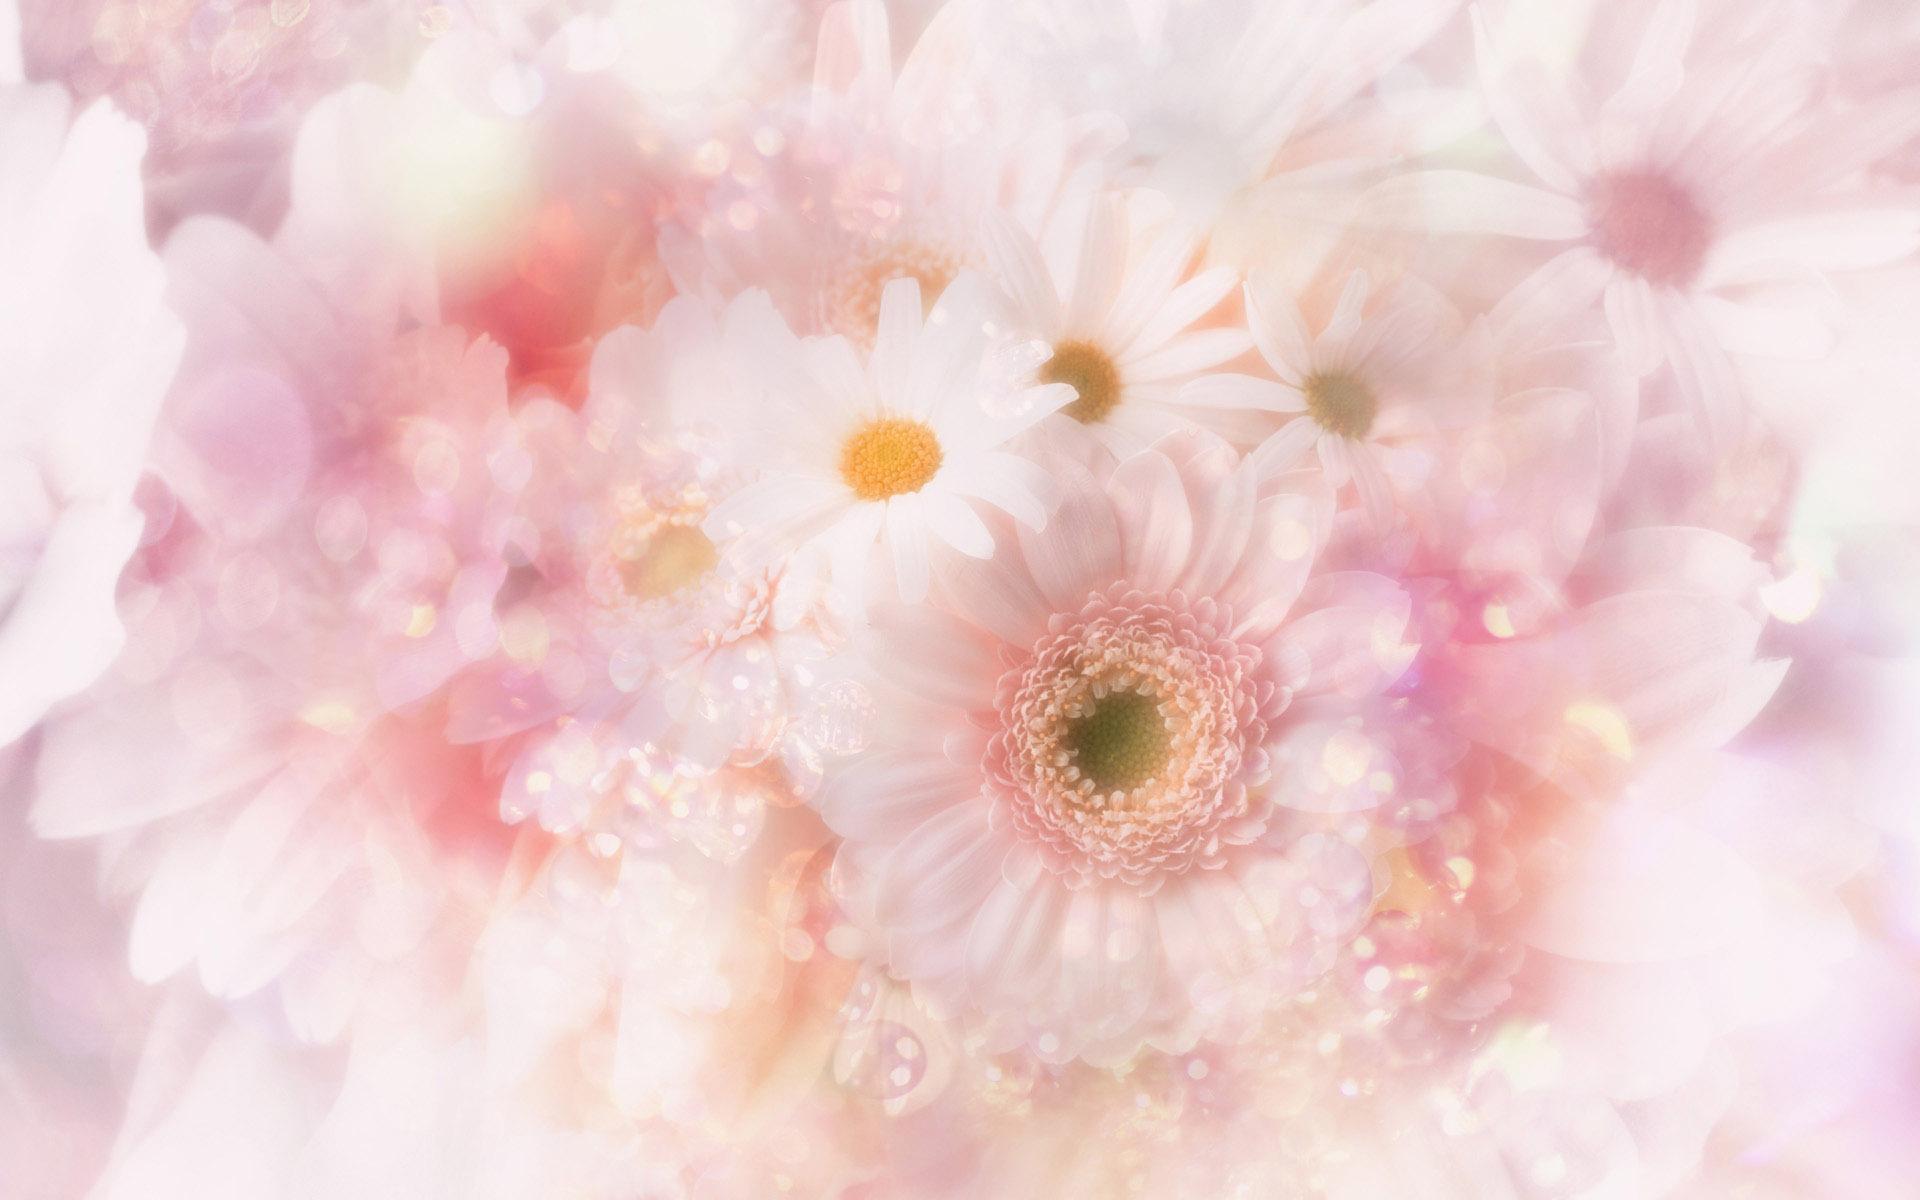 ромашки розовые белые chamomile pink white  № 1037928 загрузить